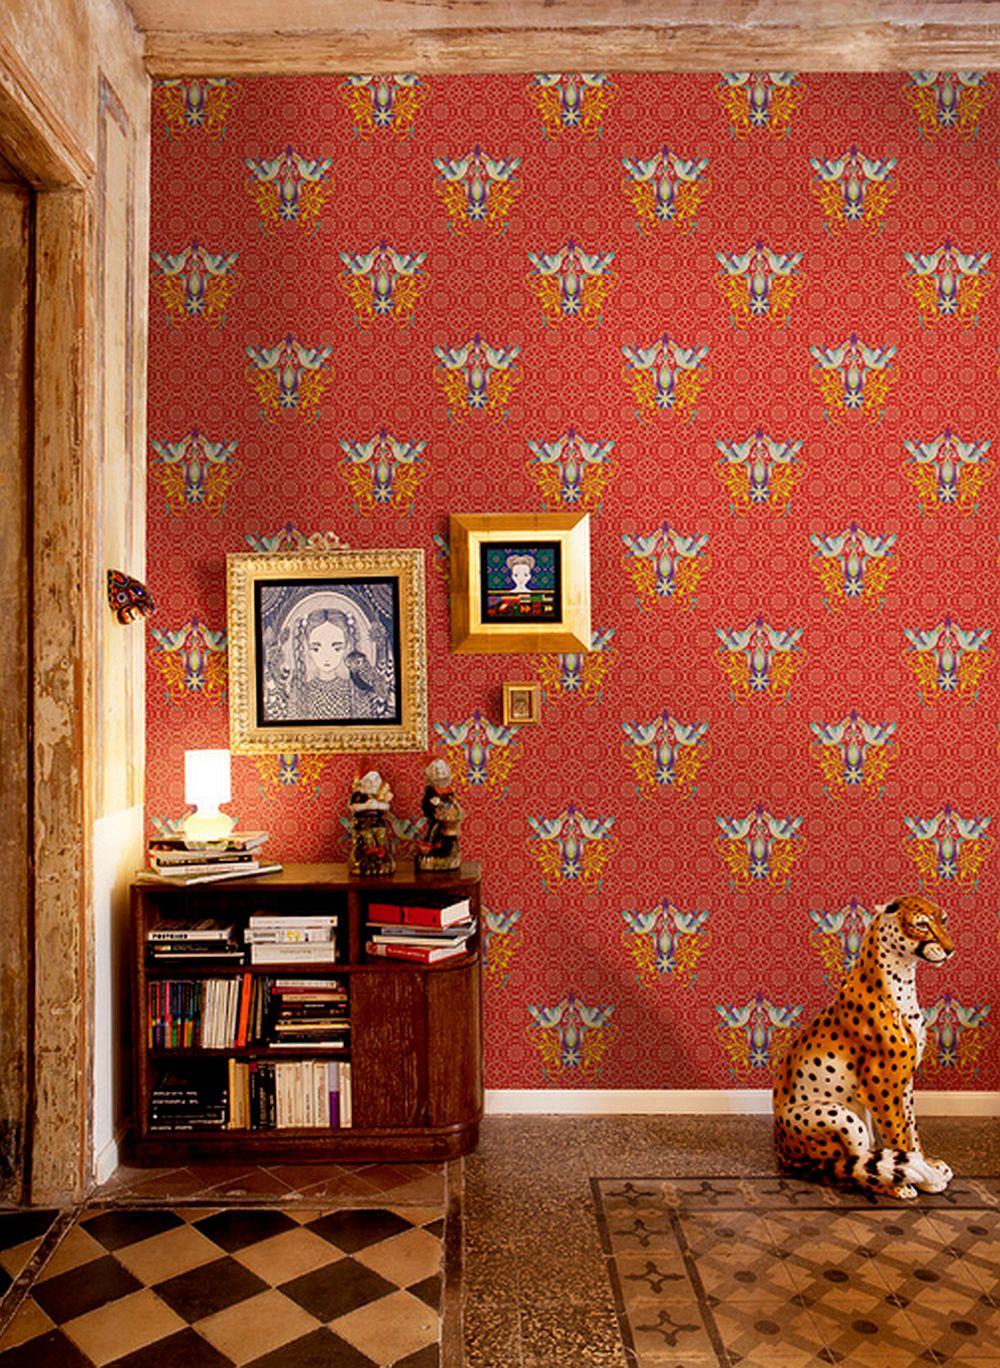 adelaparvu.com despre tapete colorate si unicate create de Catalina Estrada, Foto  (7)